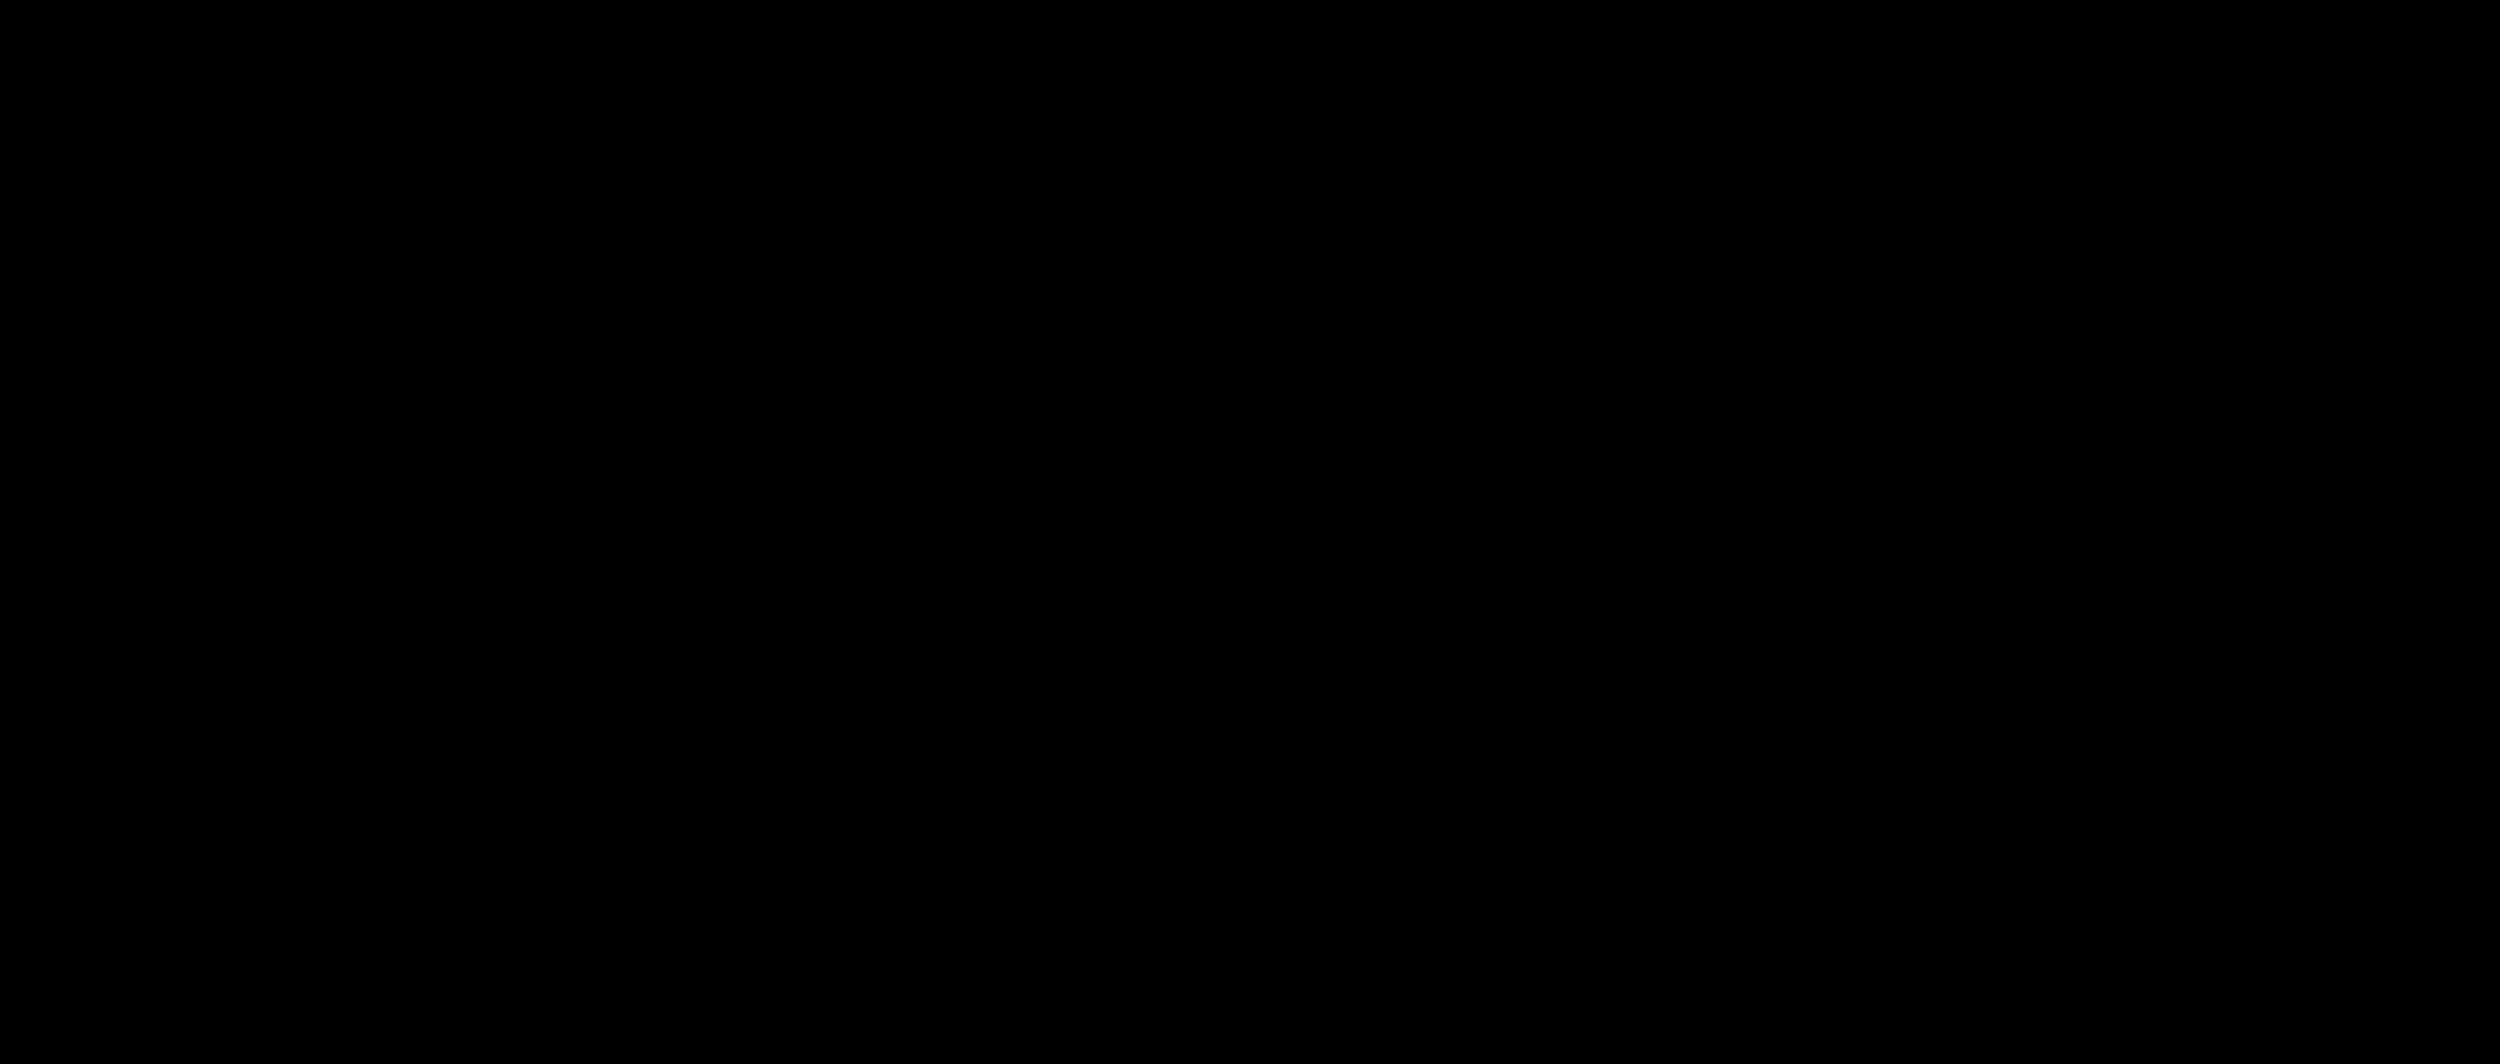 iteam-logo_black.png